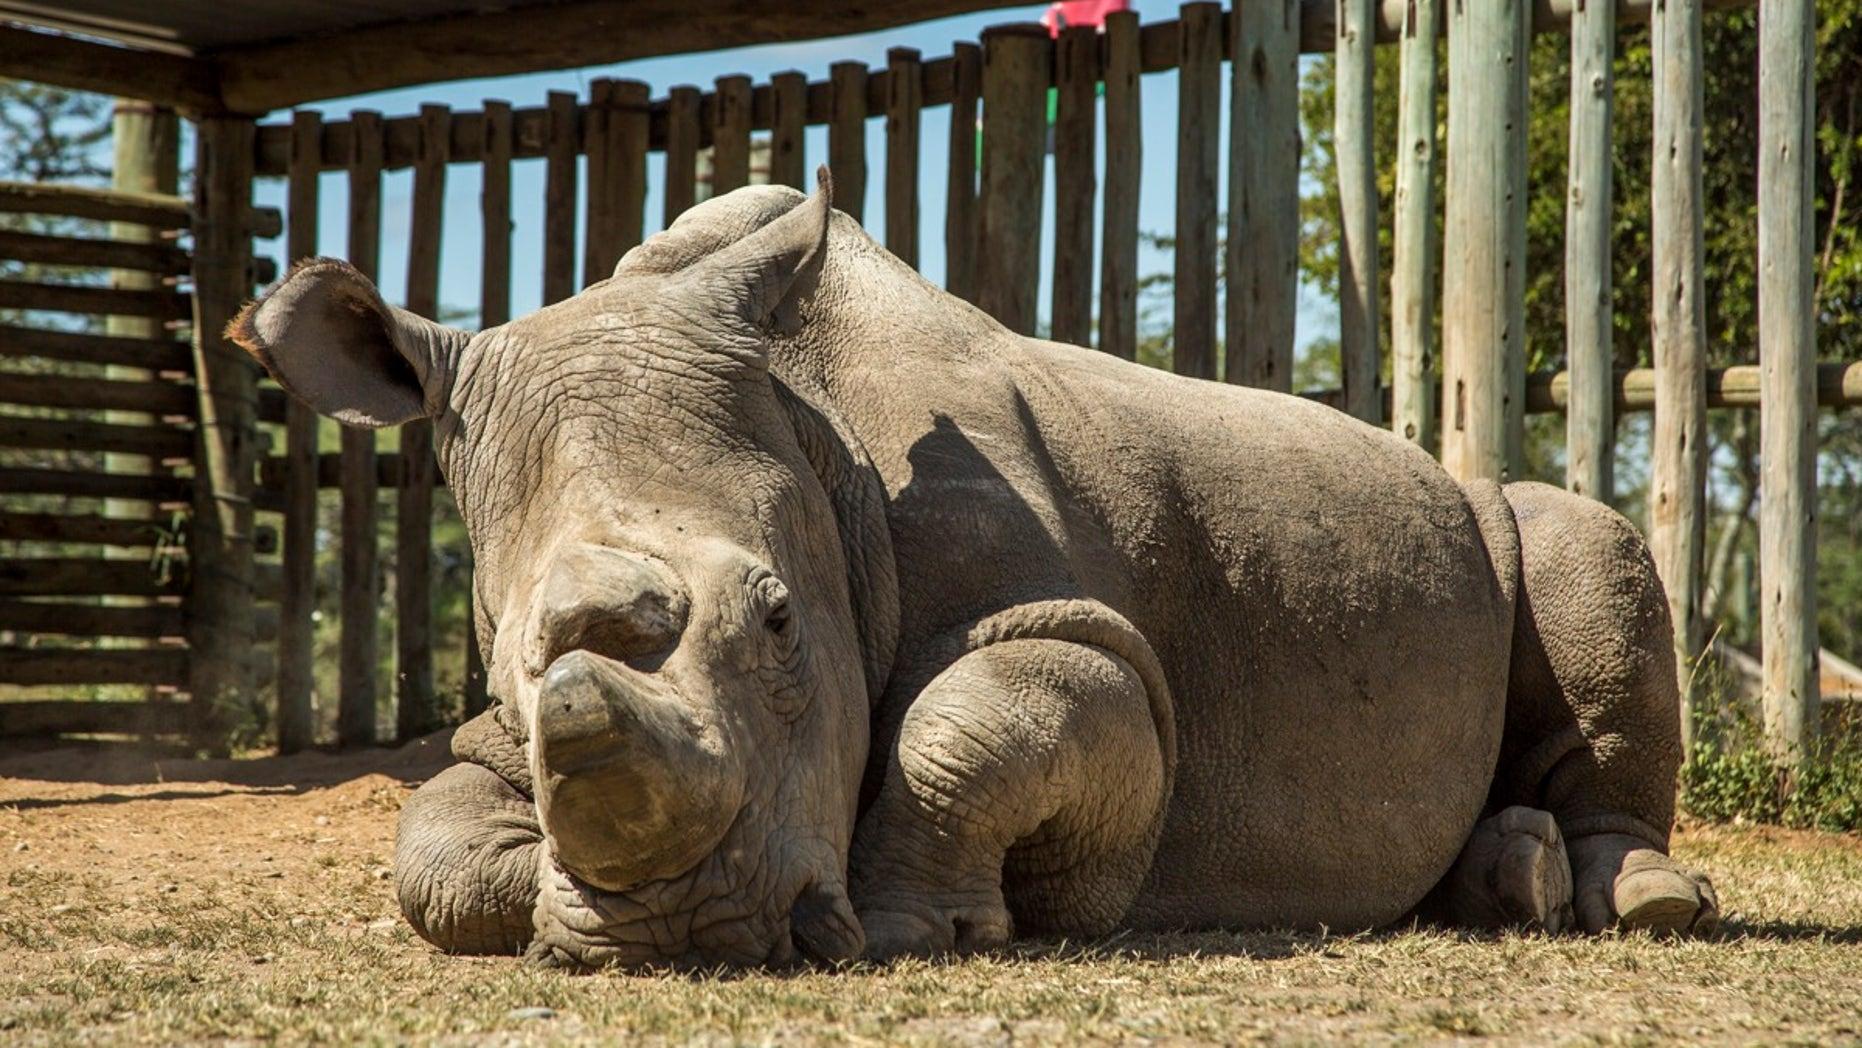 Sudan, the last male northern white rhino, at Ol Pejeta Conservancy in Kenya on June 25, 2015.